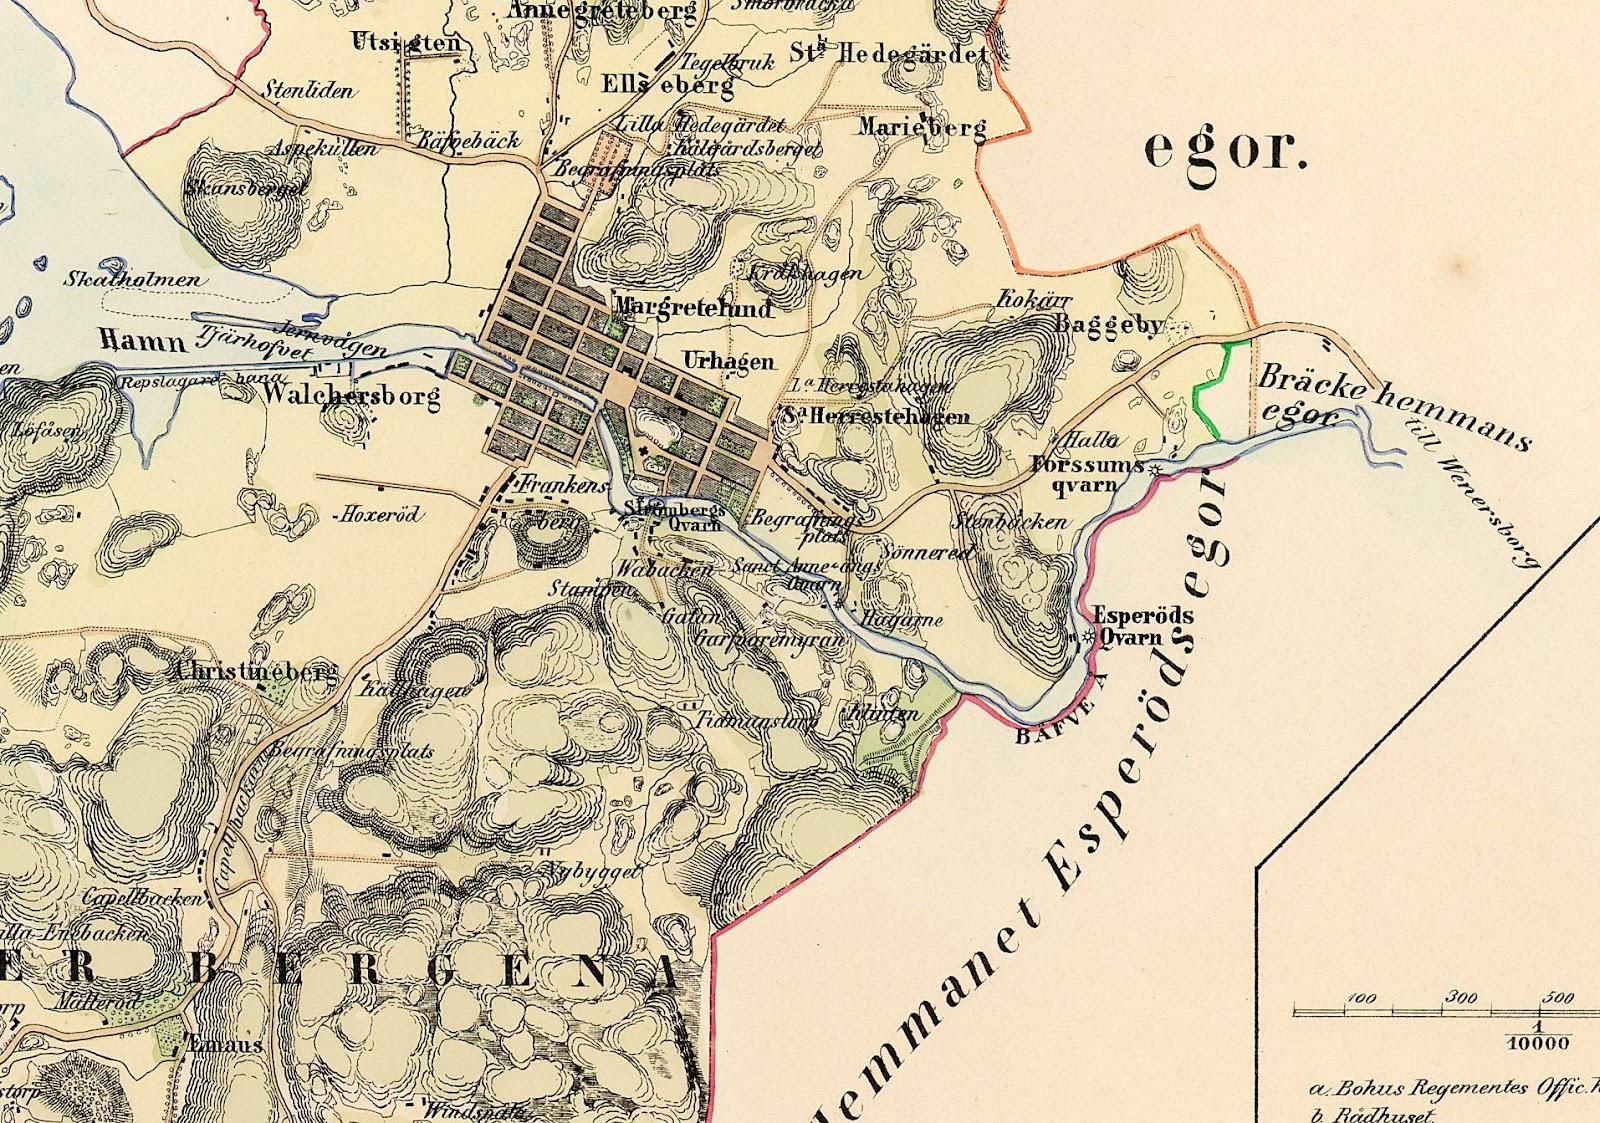 karta uddevalla uddevallabloggen.se: Mera Uddevalla 1855 karta uddevalla